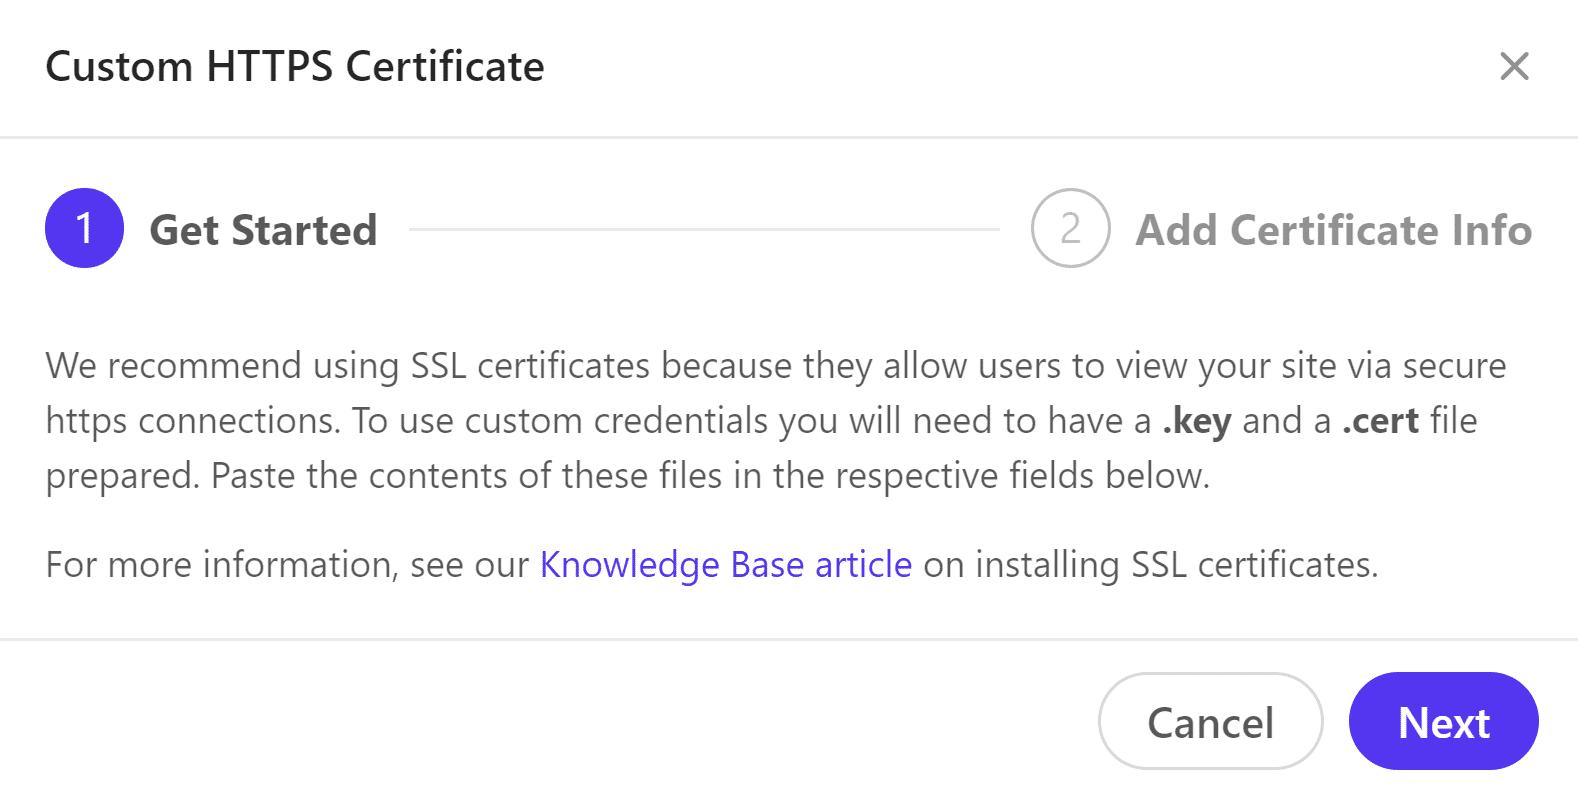 Gepersonaliseerde HTTPS-gegevens